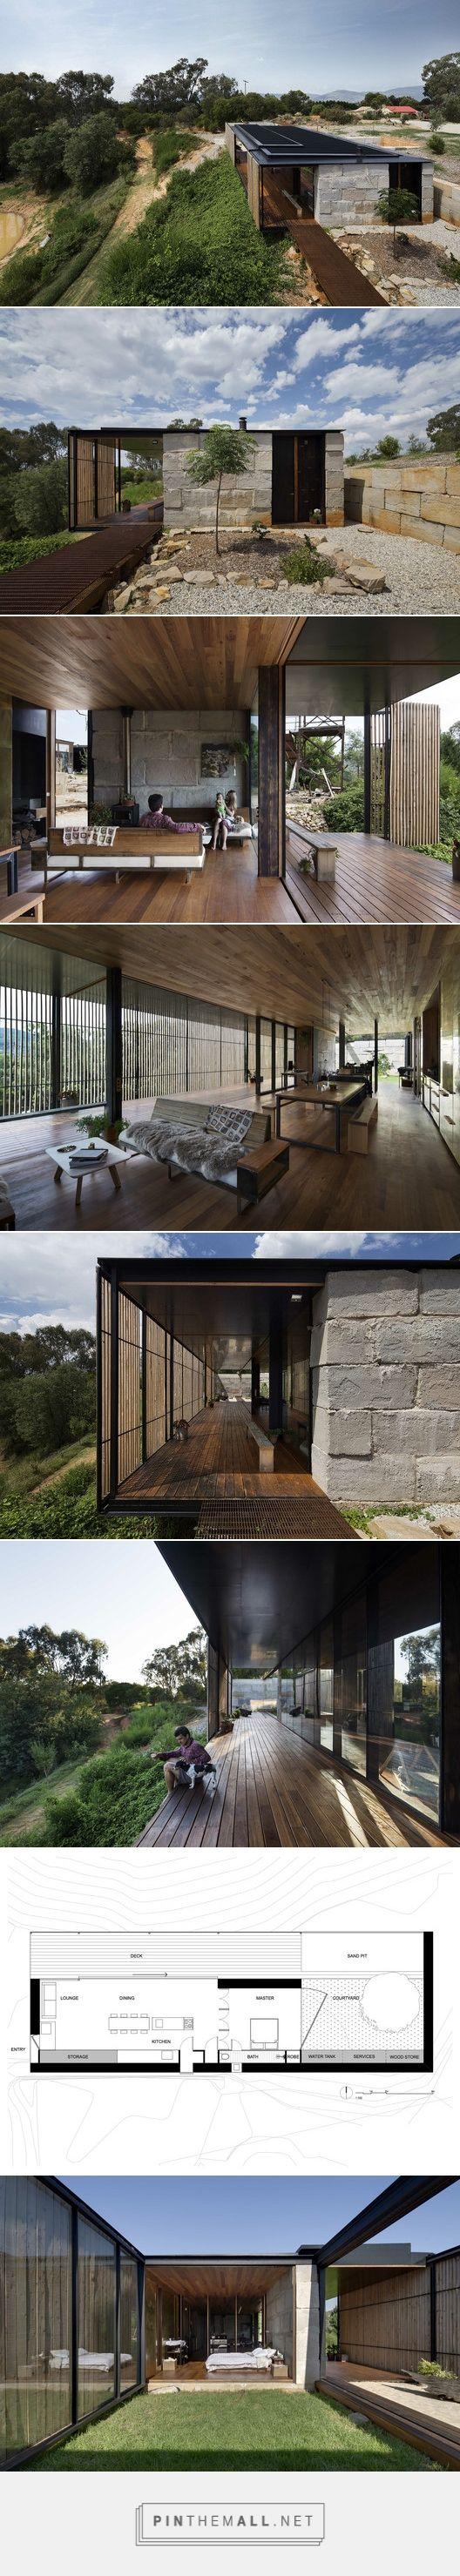 SawMill House Archier Studio 17 best